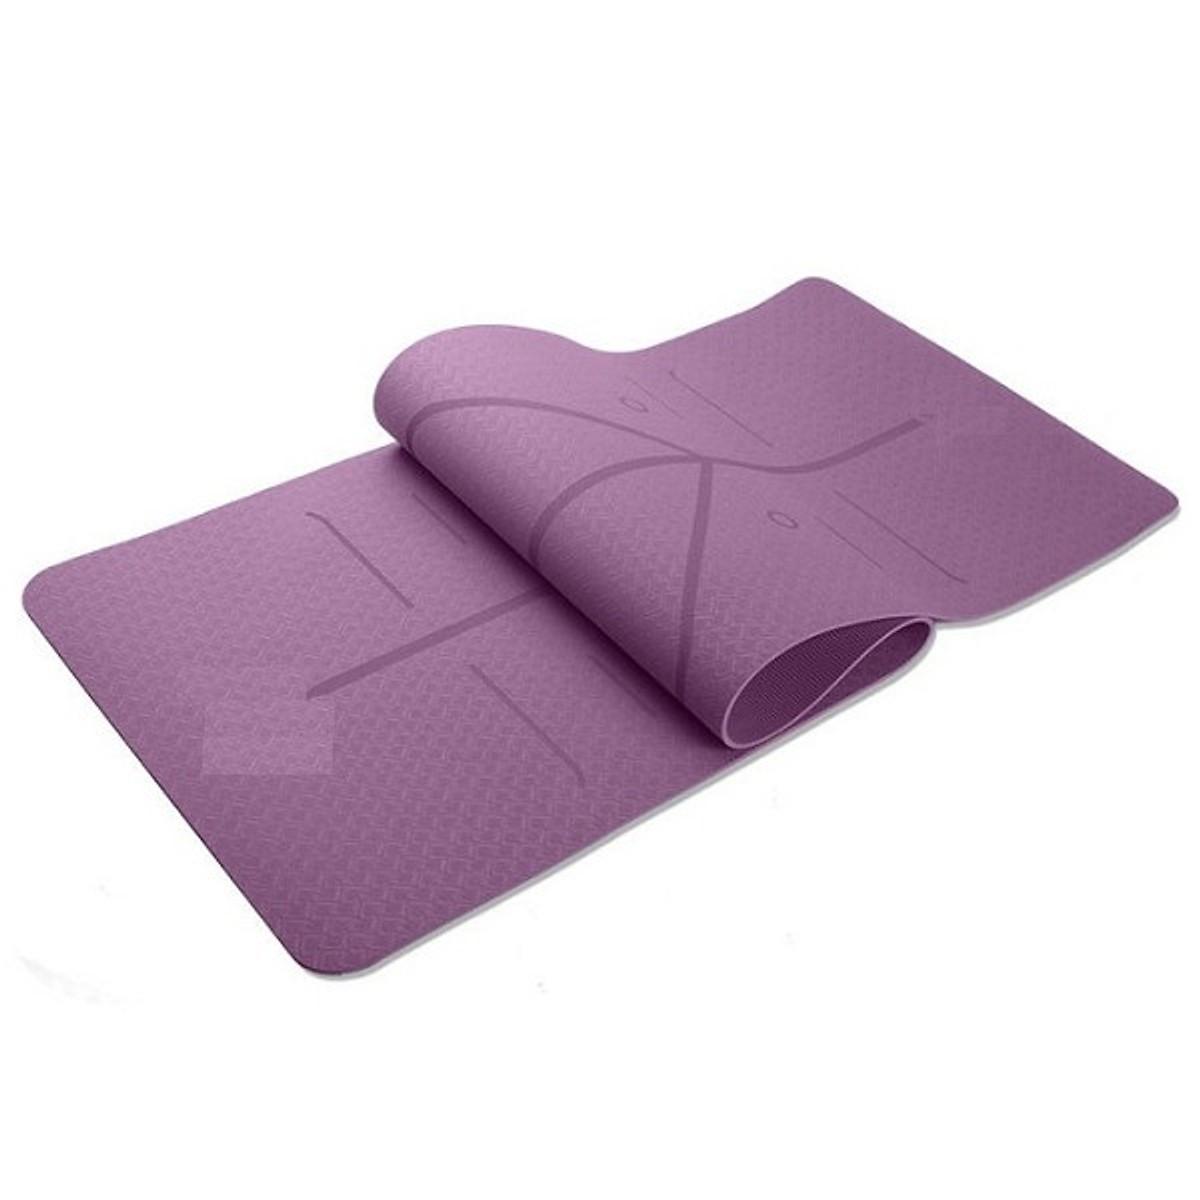 Thảm yoga Atmananda